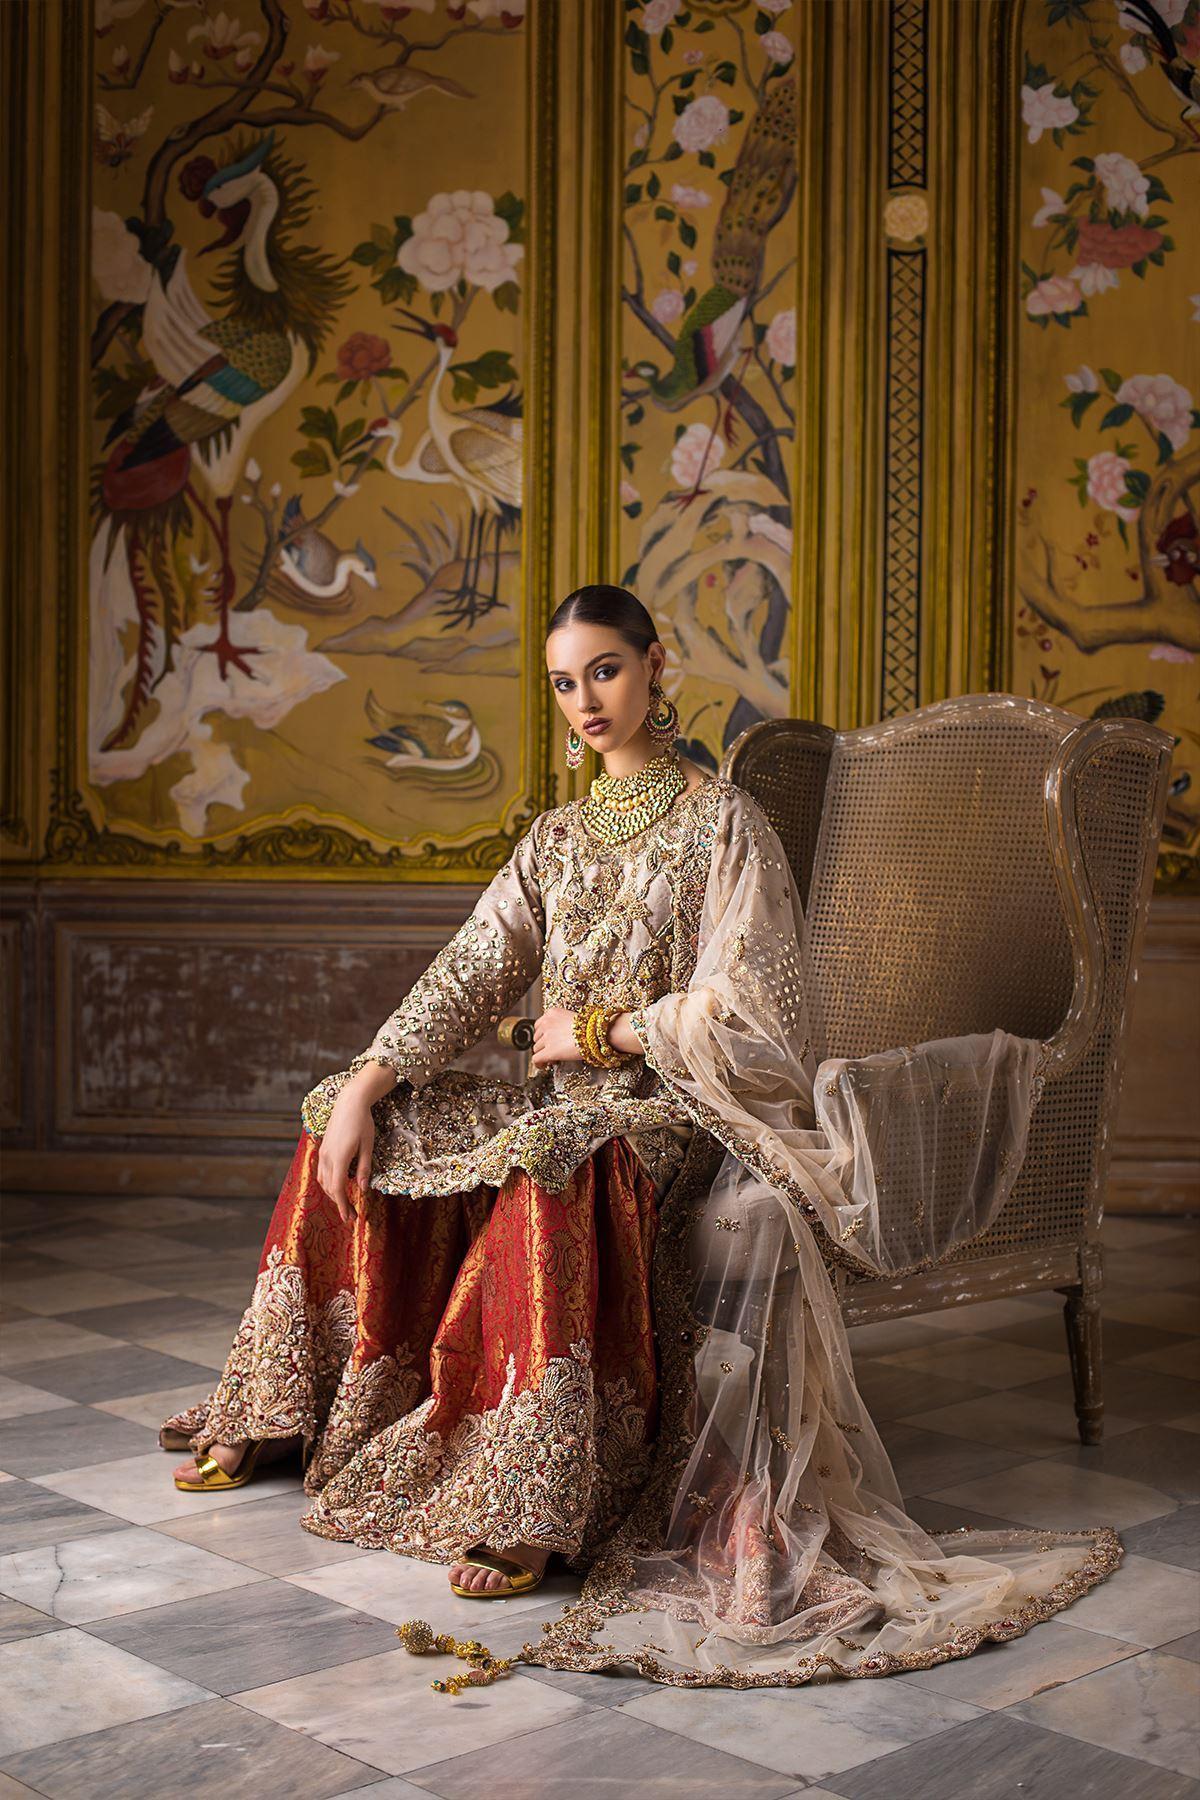 Moazzam Khan Party Wear Bridal Gharara and Dupatta in Pastel for Women